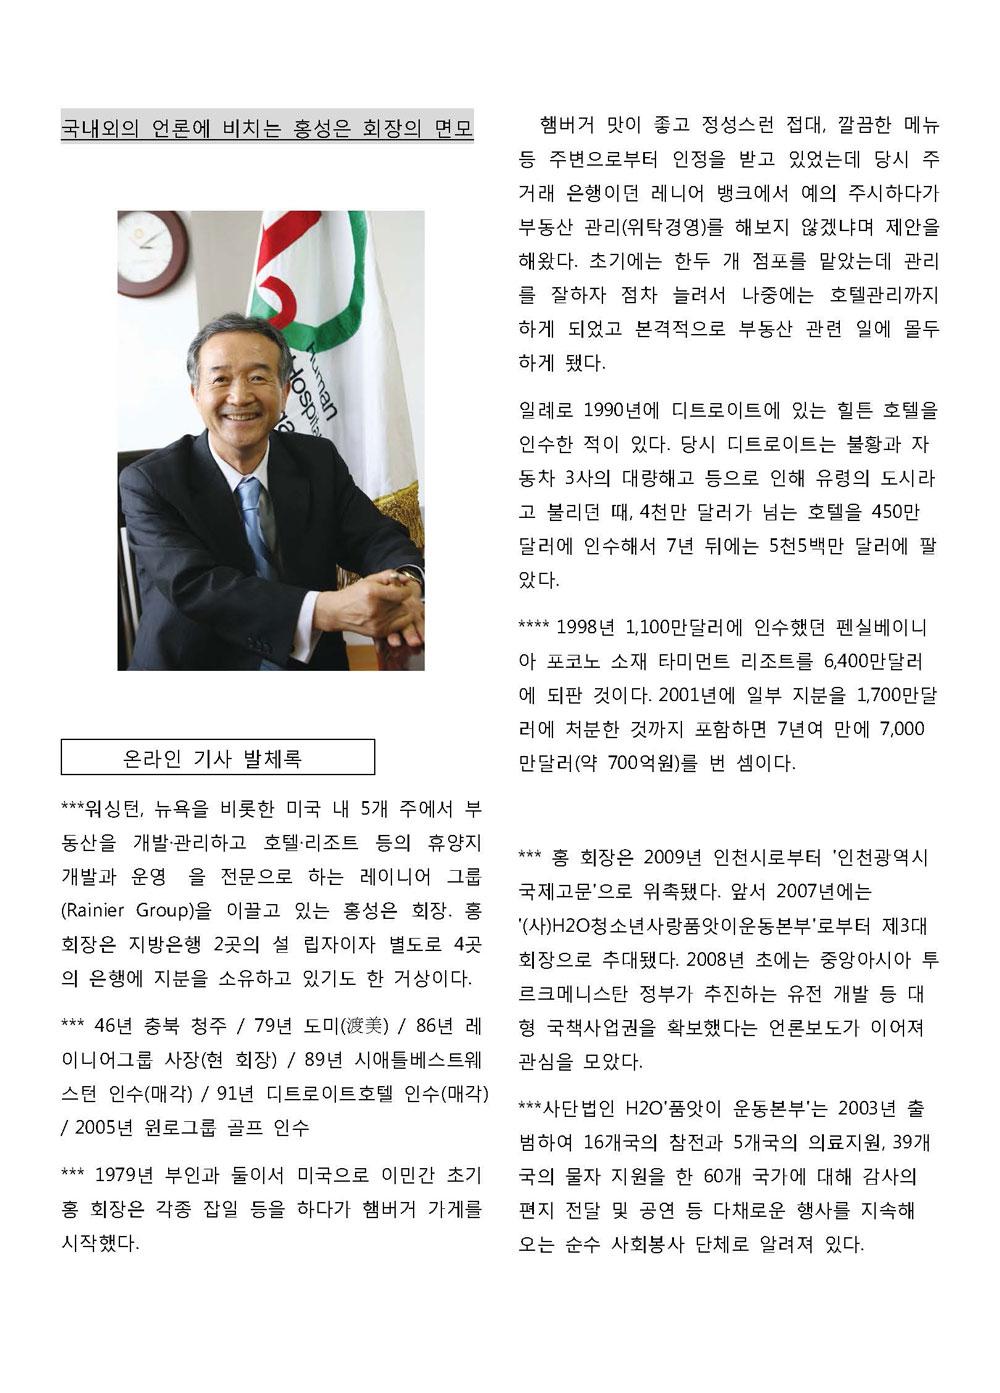 hong_sung_eun_Page_1.jpg